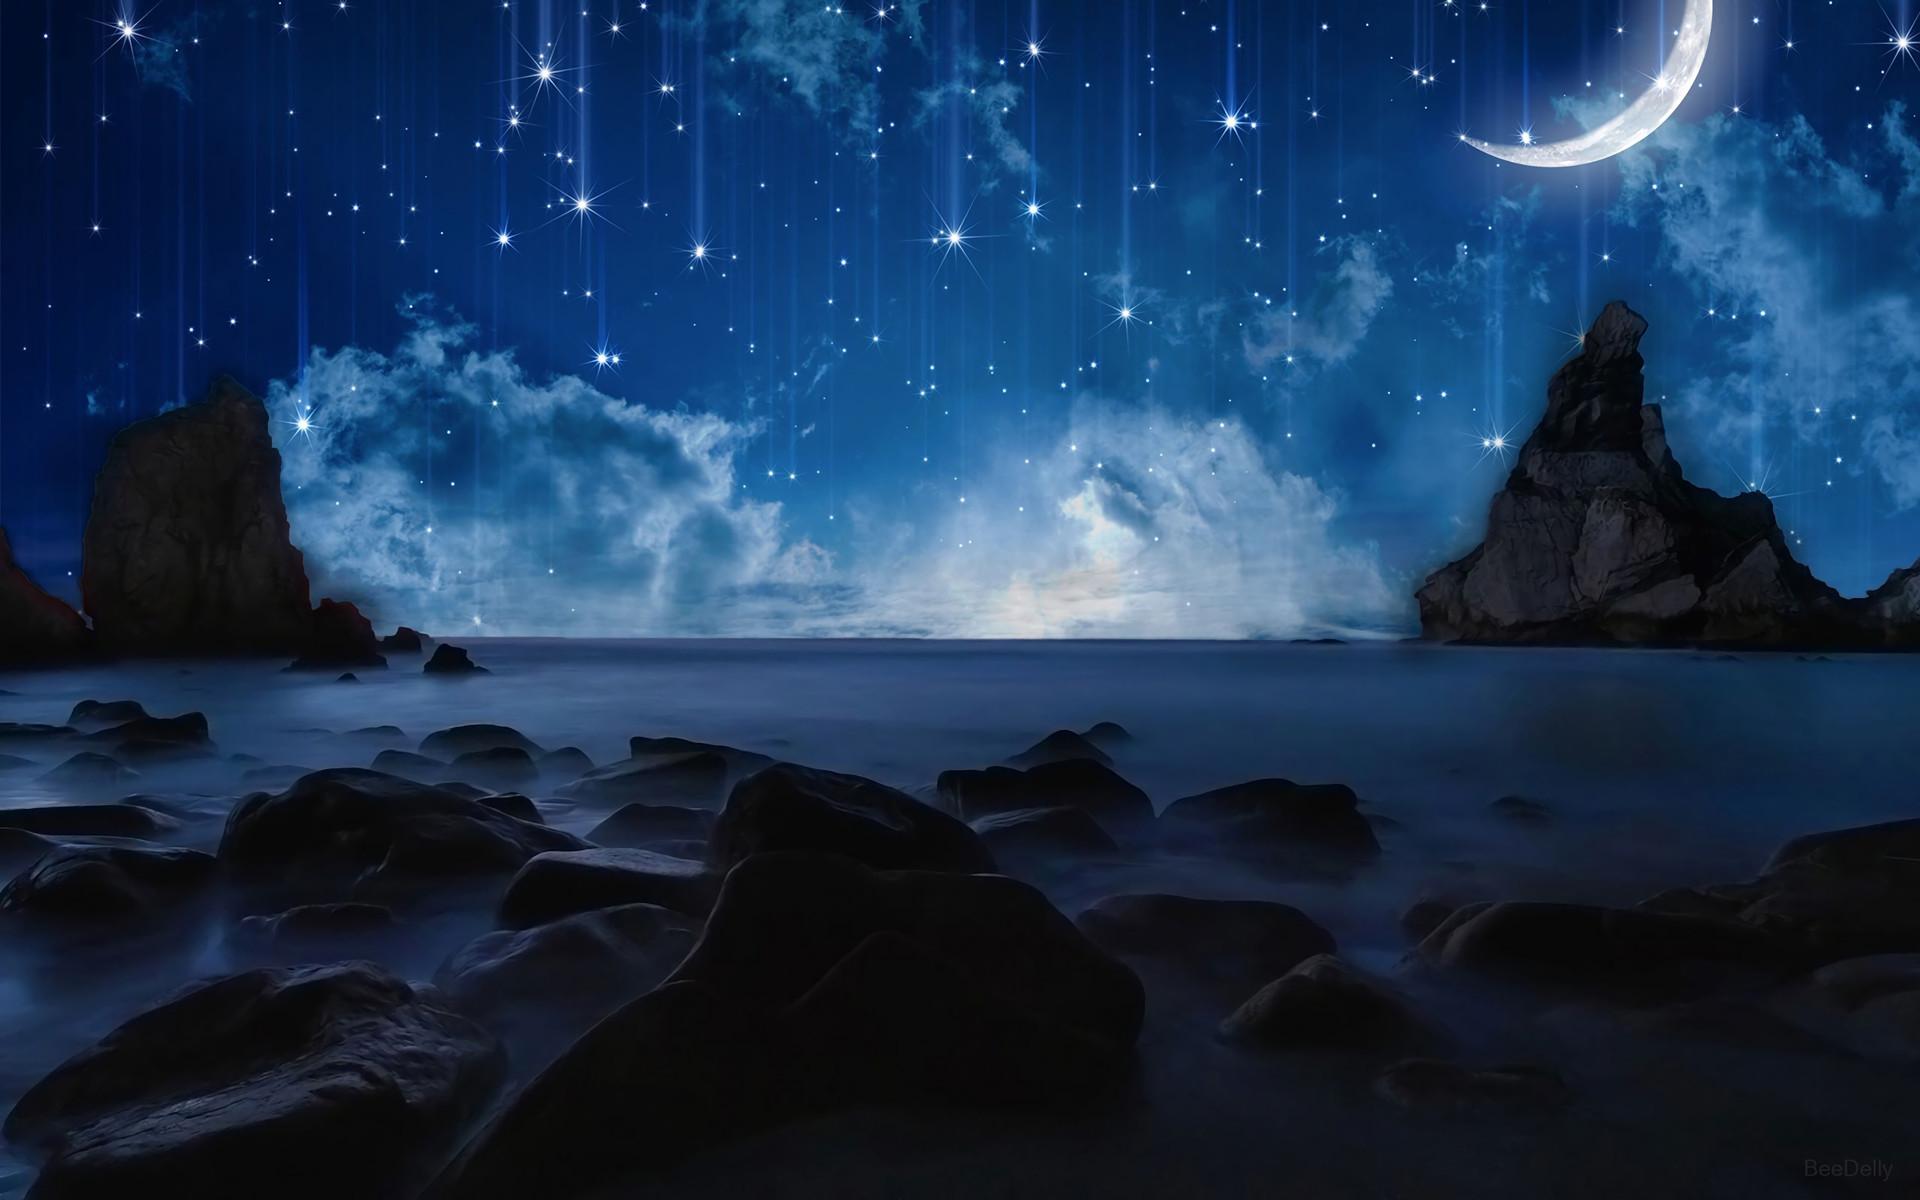 Artistic – Ocean Artistic Space Rock Star Moon Sky Wallpaper